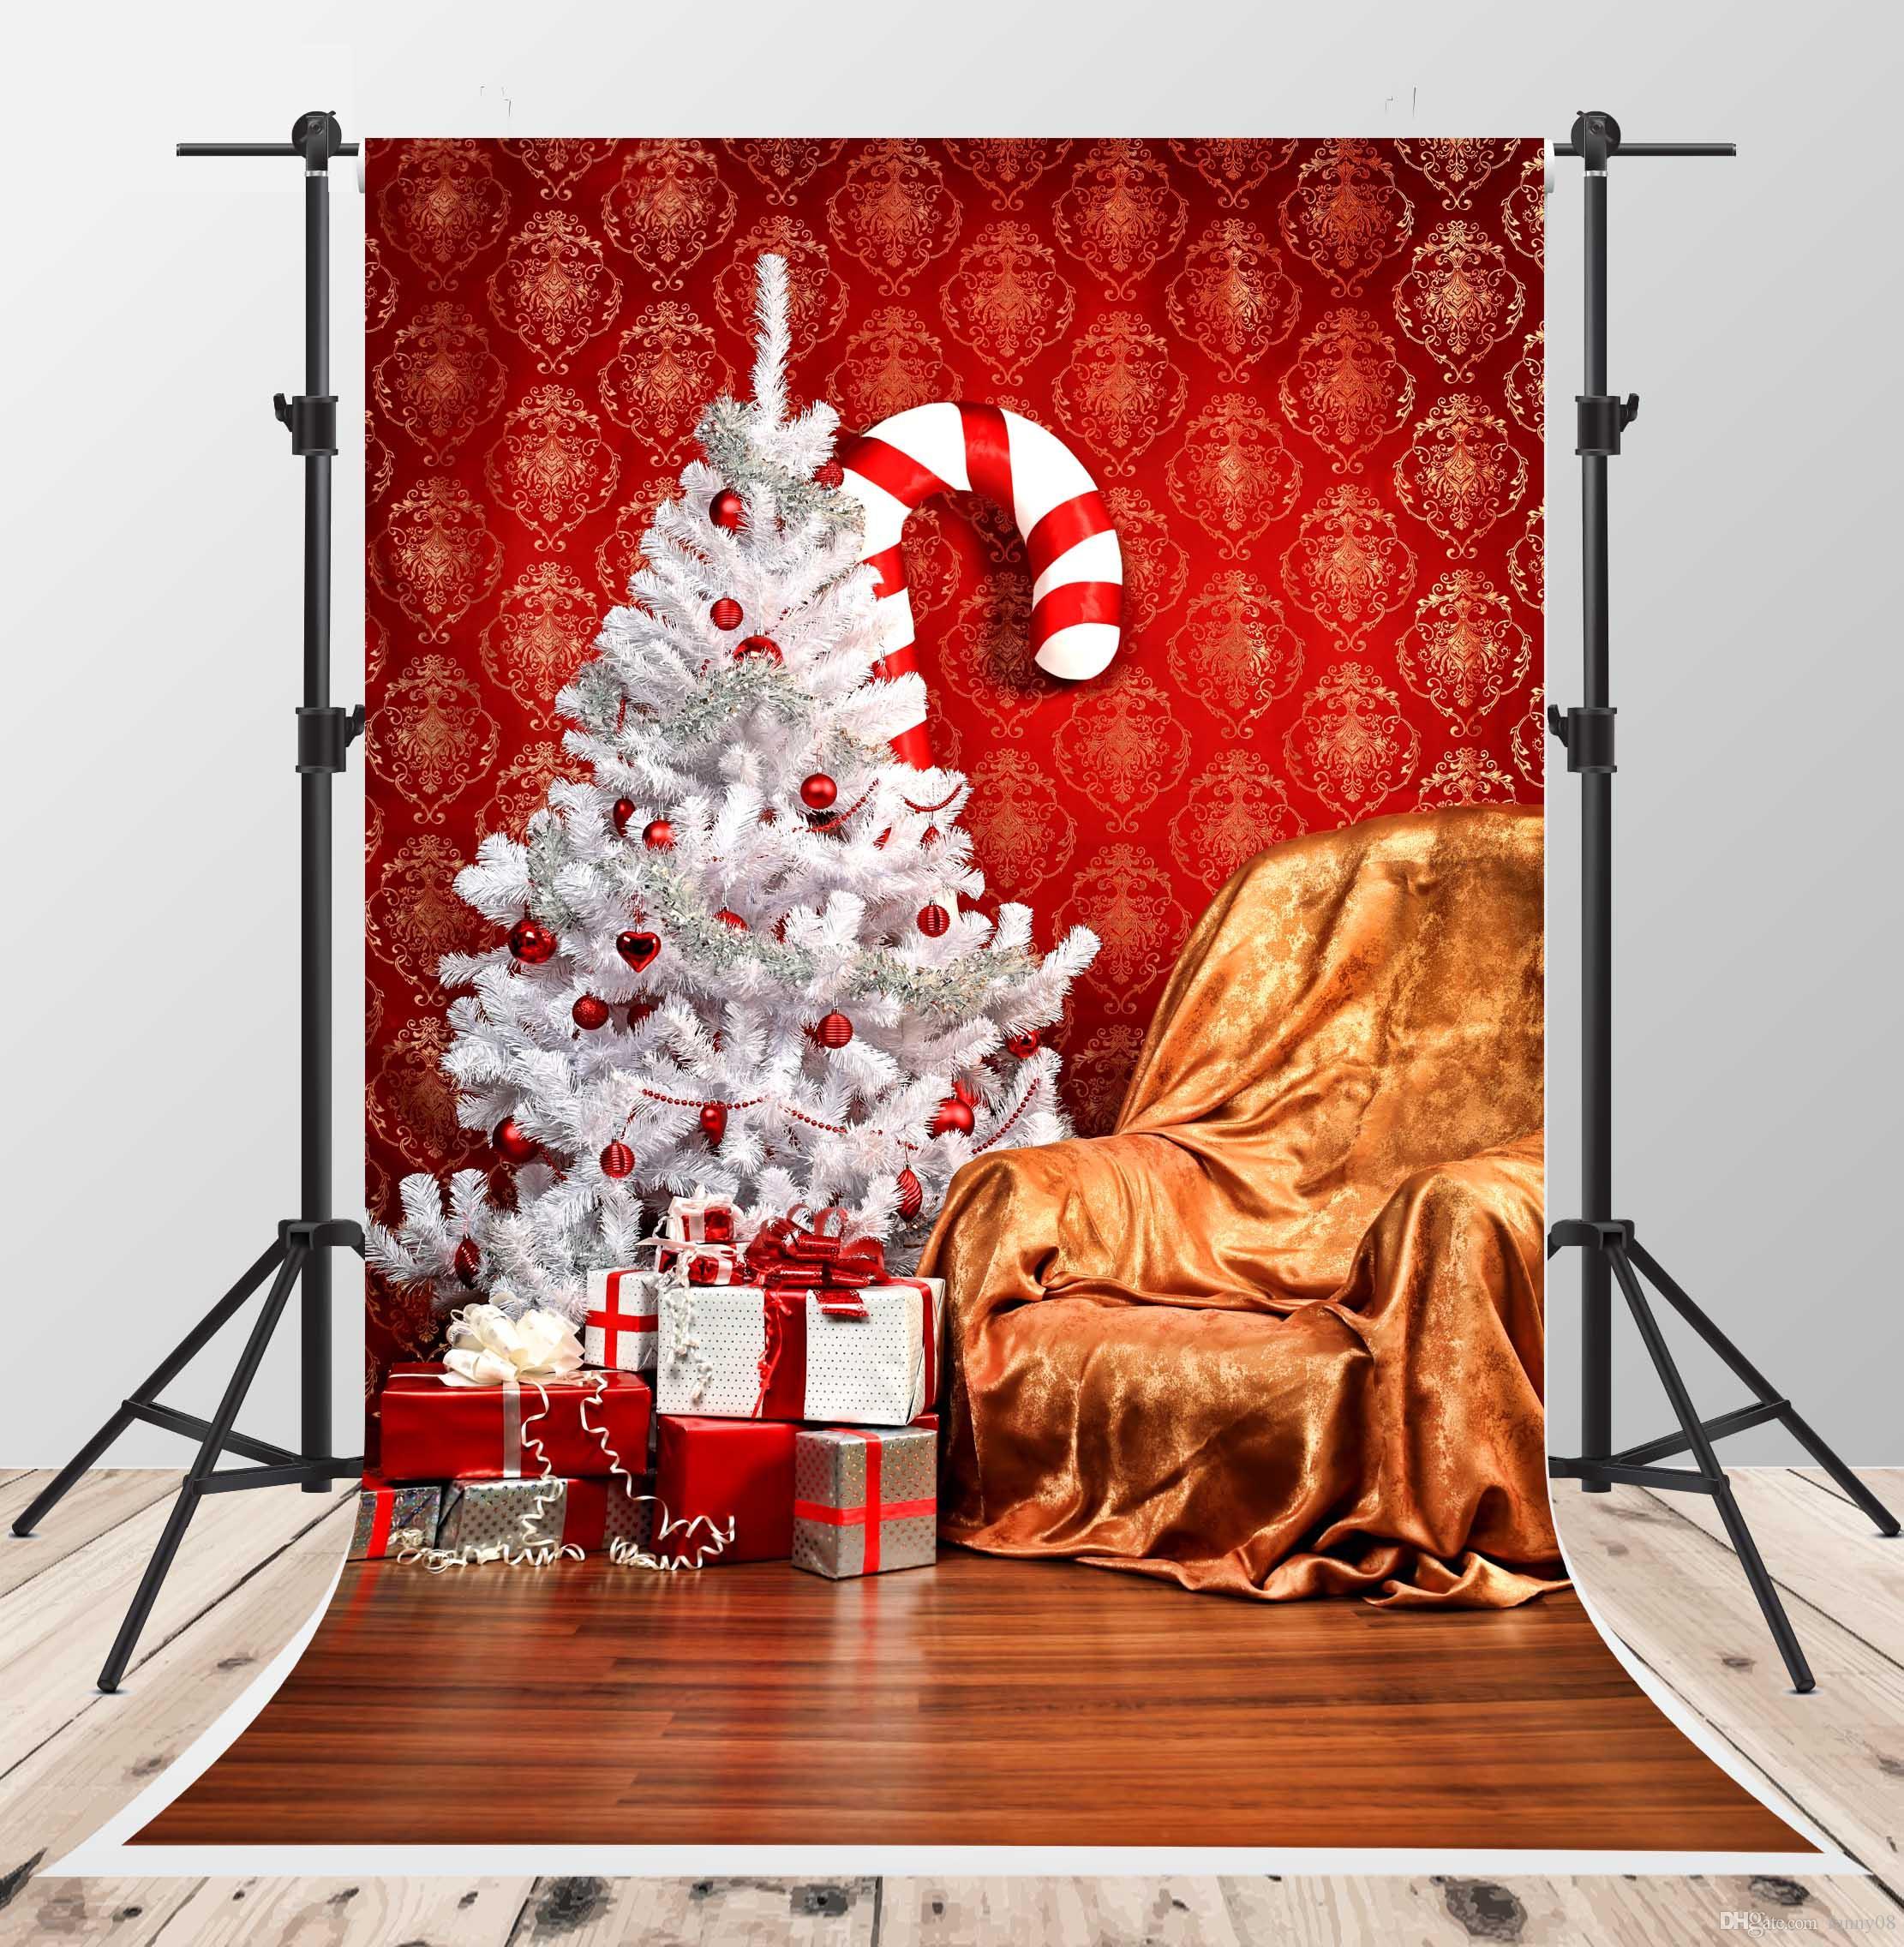 2018 White Christmas Tree Photo Backgrounds Wood Floor